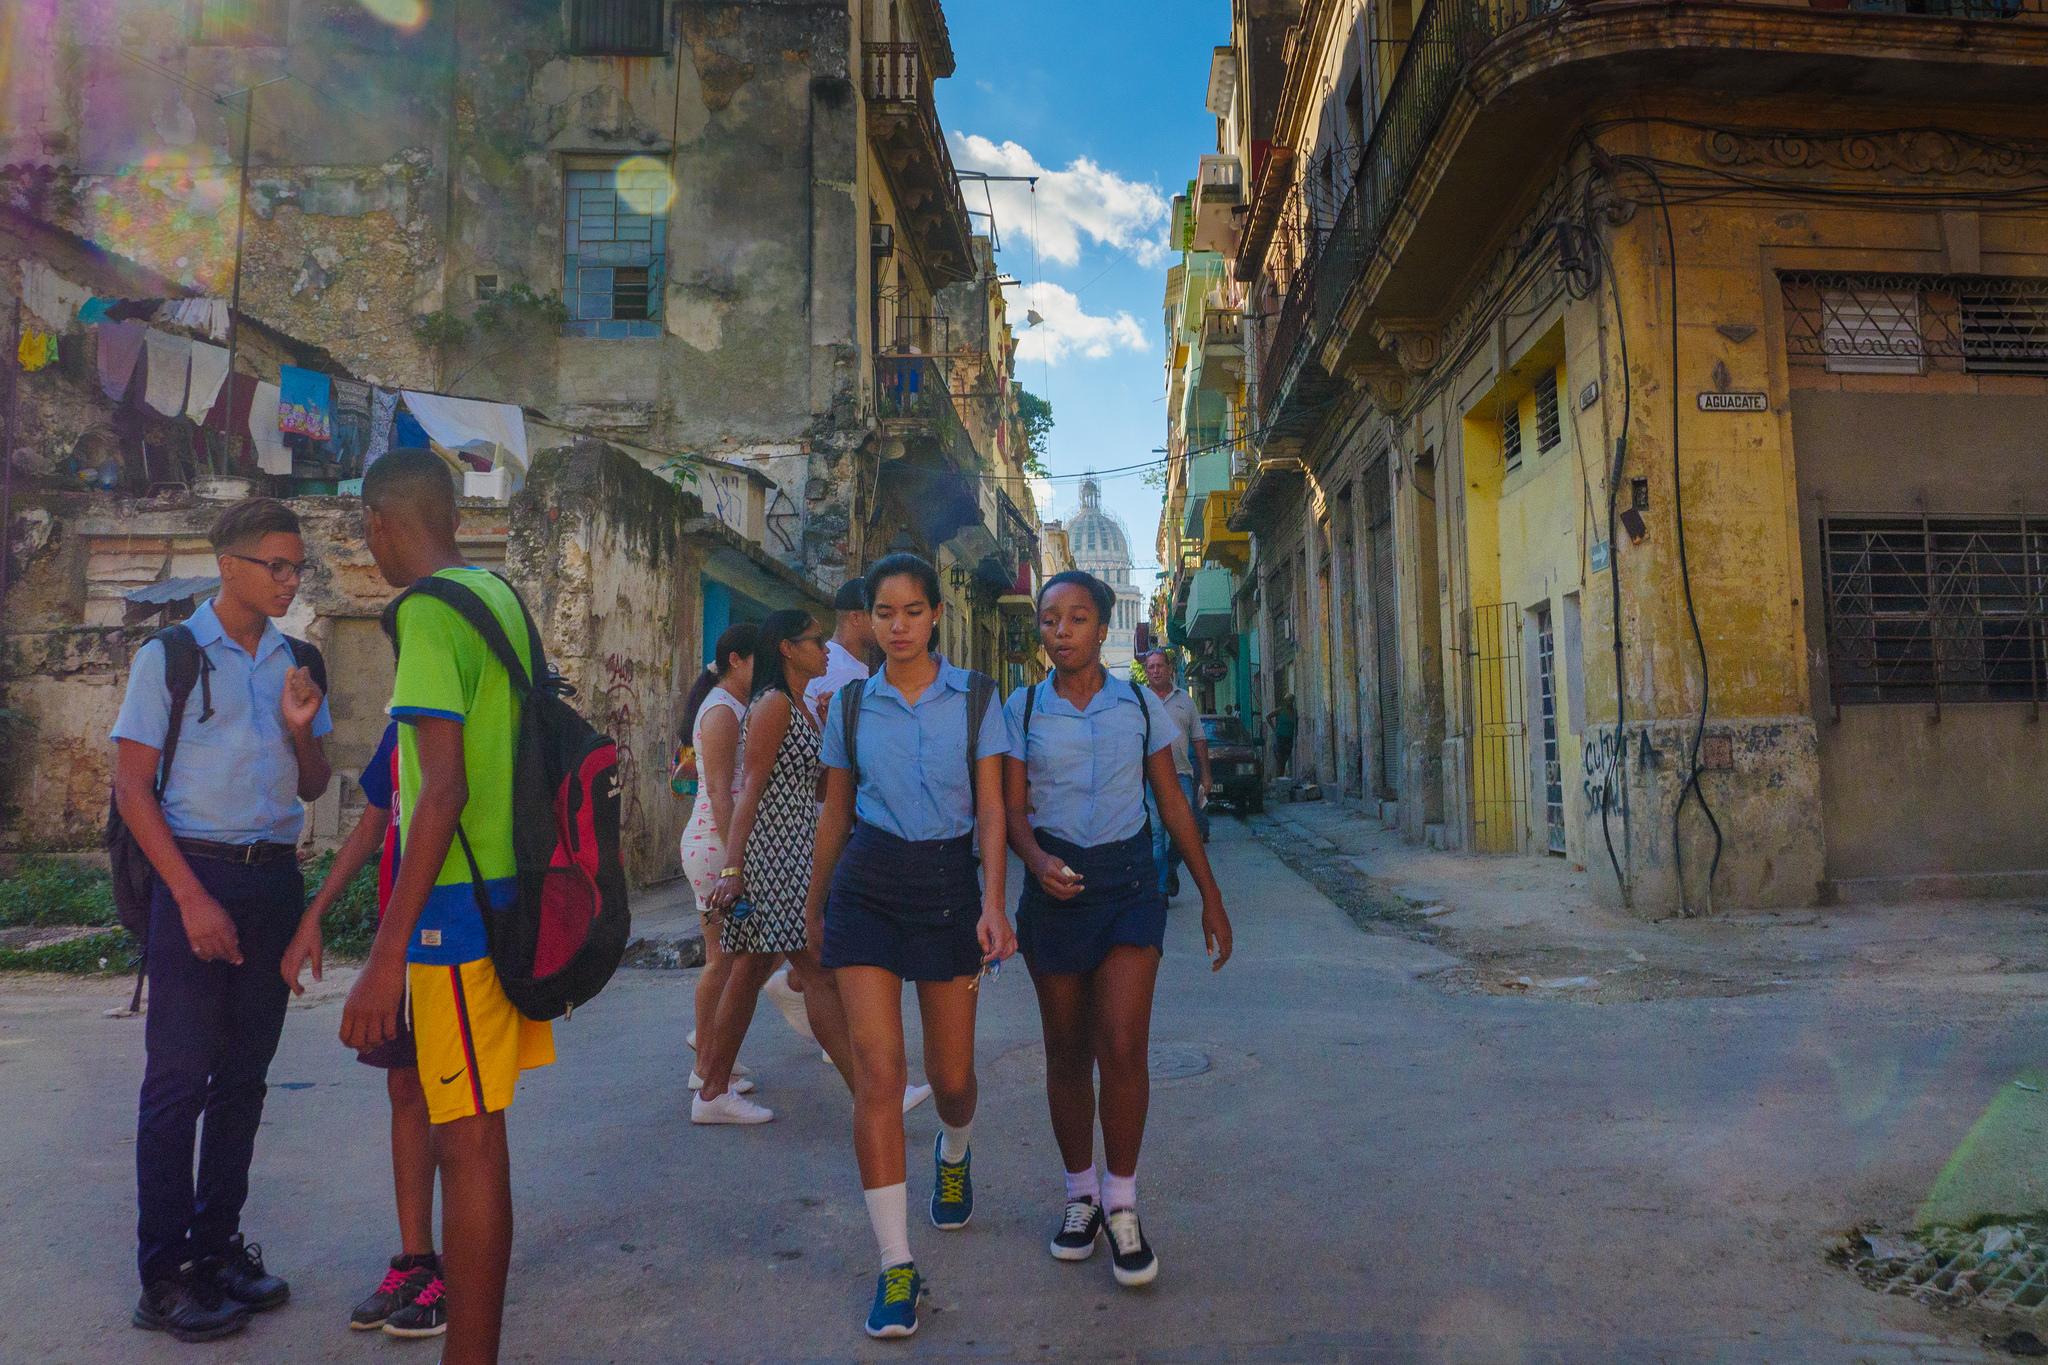 Habana Vieja. Photo taken on Panasonic GH5 and Lumix 12-35 f2.8 lense